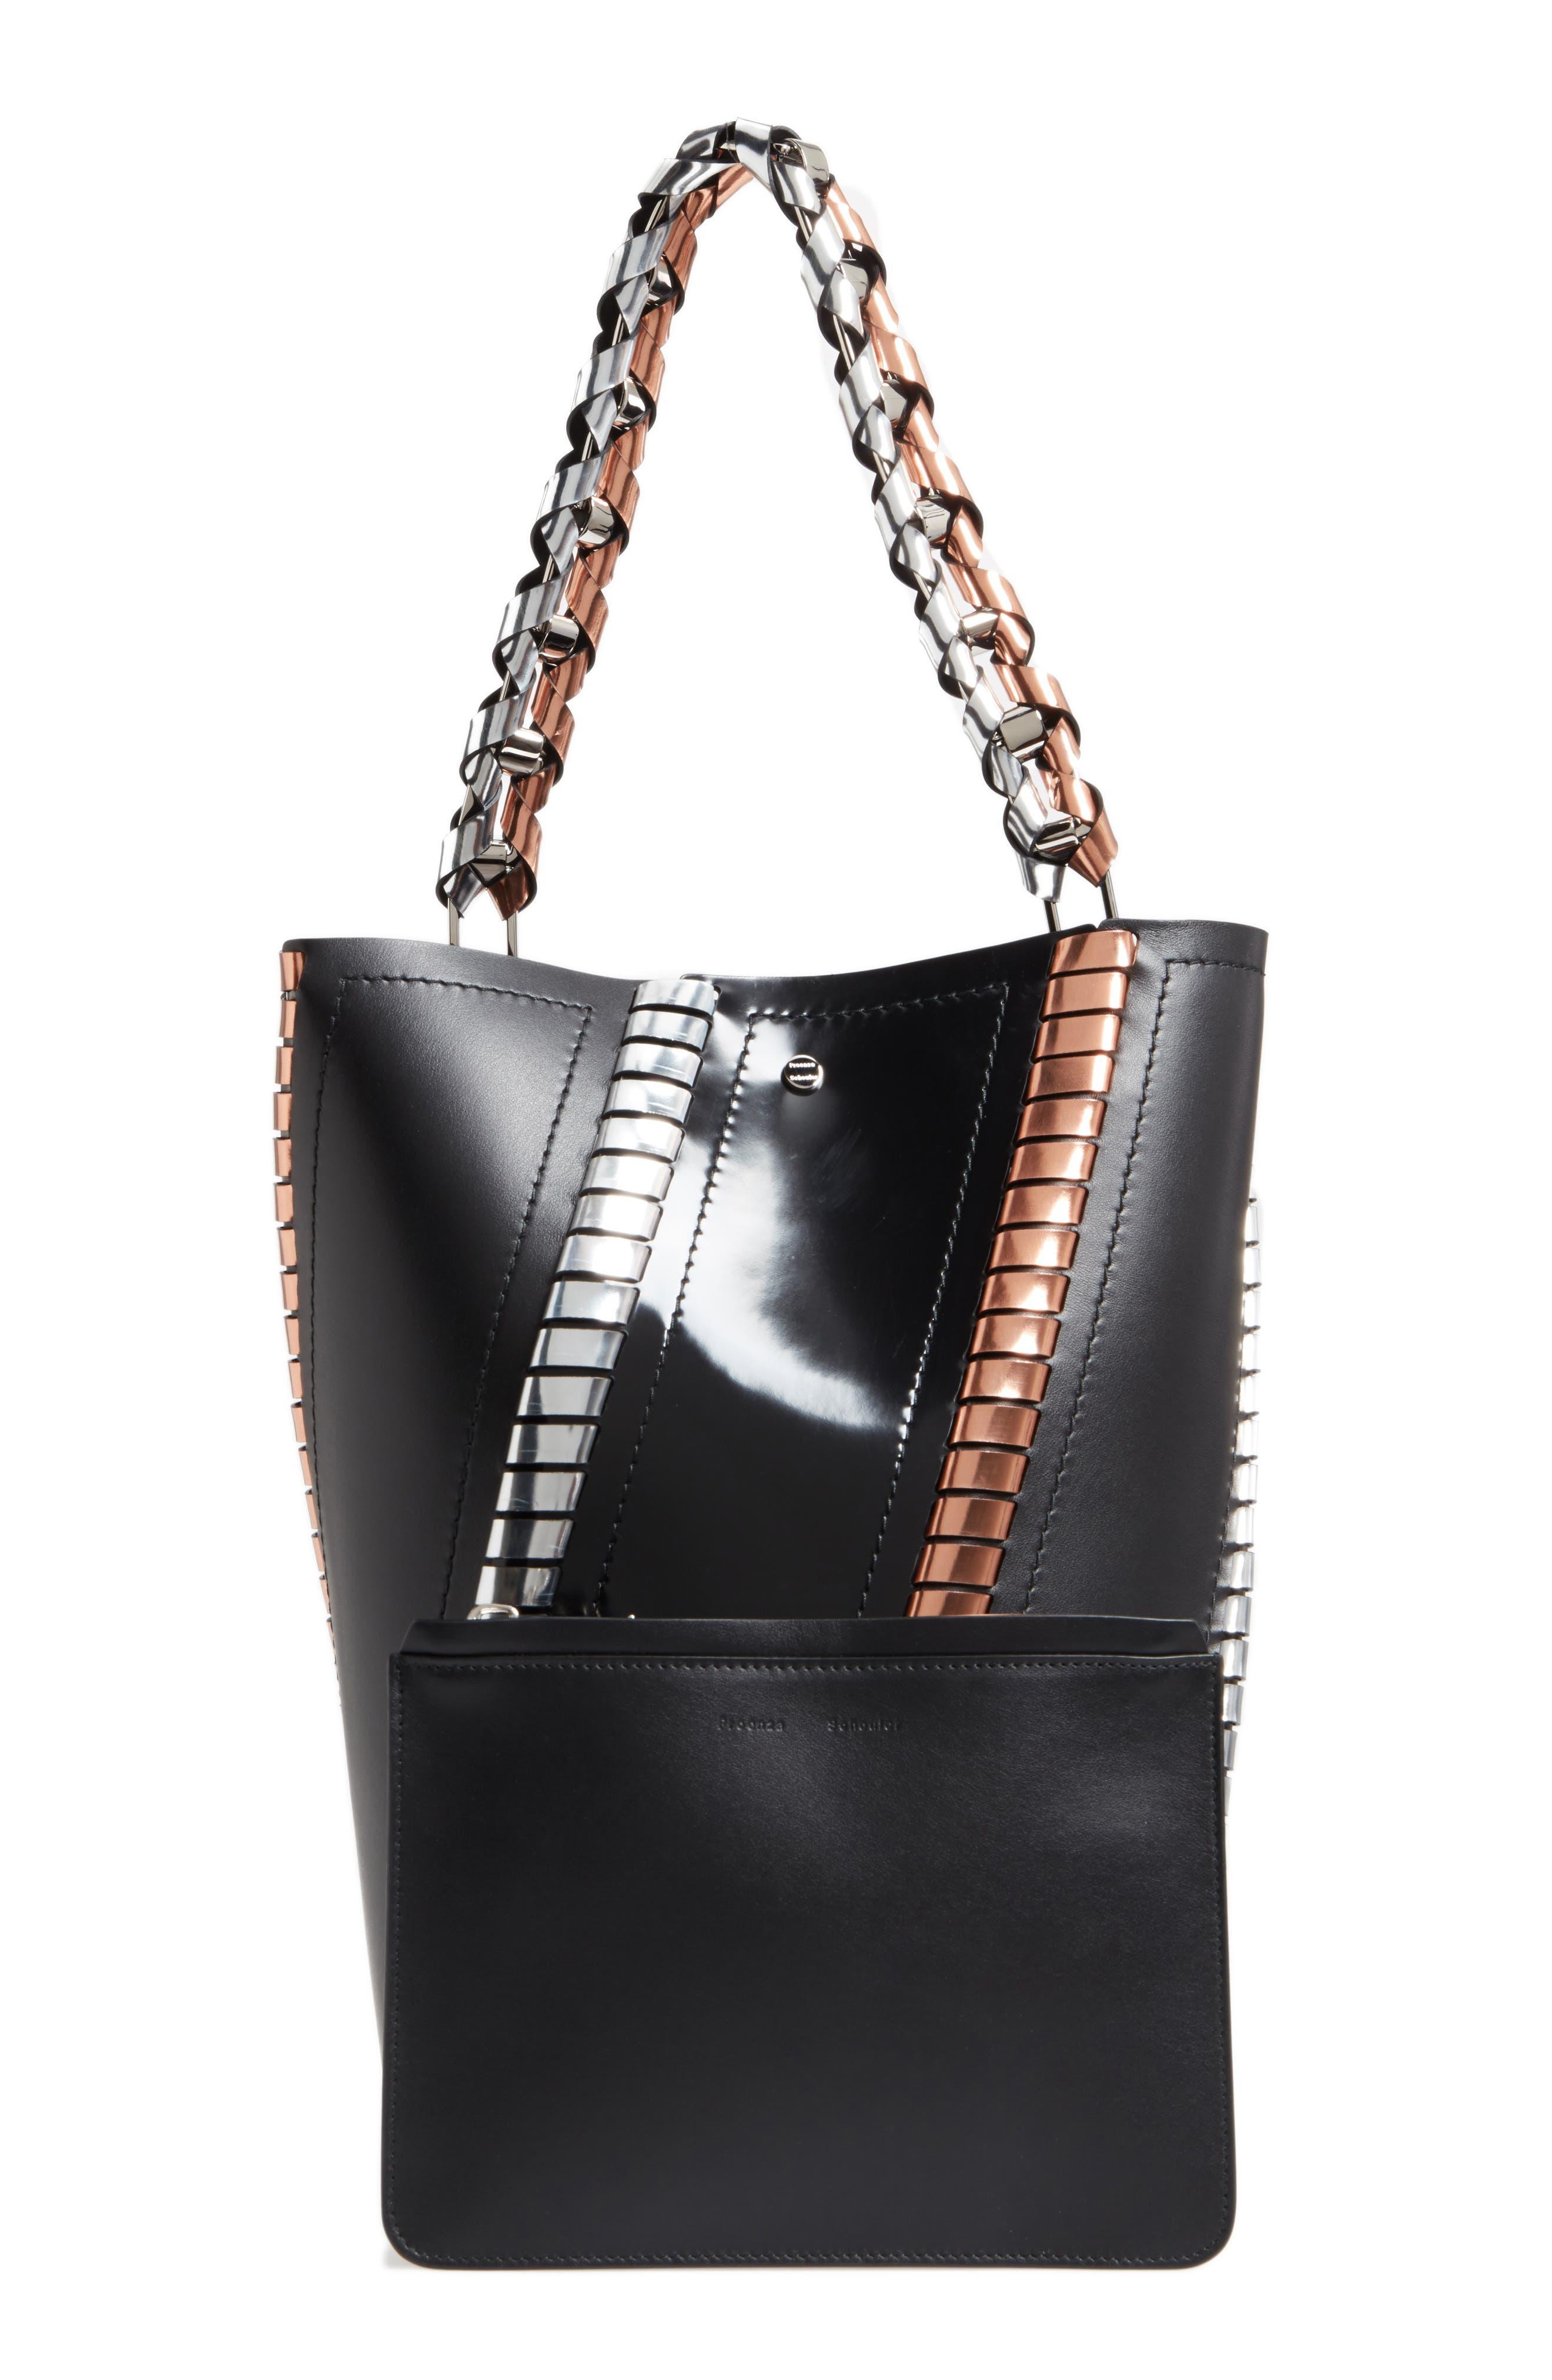 Medium Hex Metallic Whipstitch Leather Bucket Bag,                             Alternate thumbnail 2, color,                             Black Mix